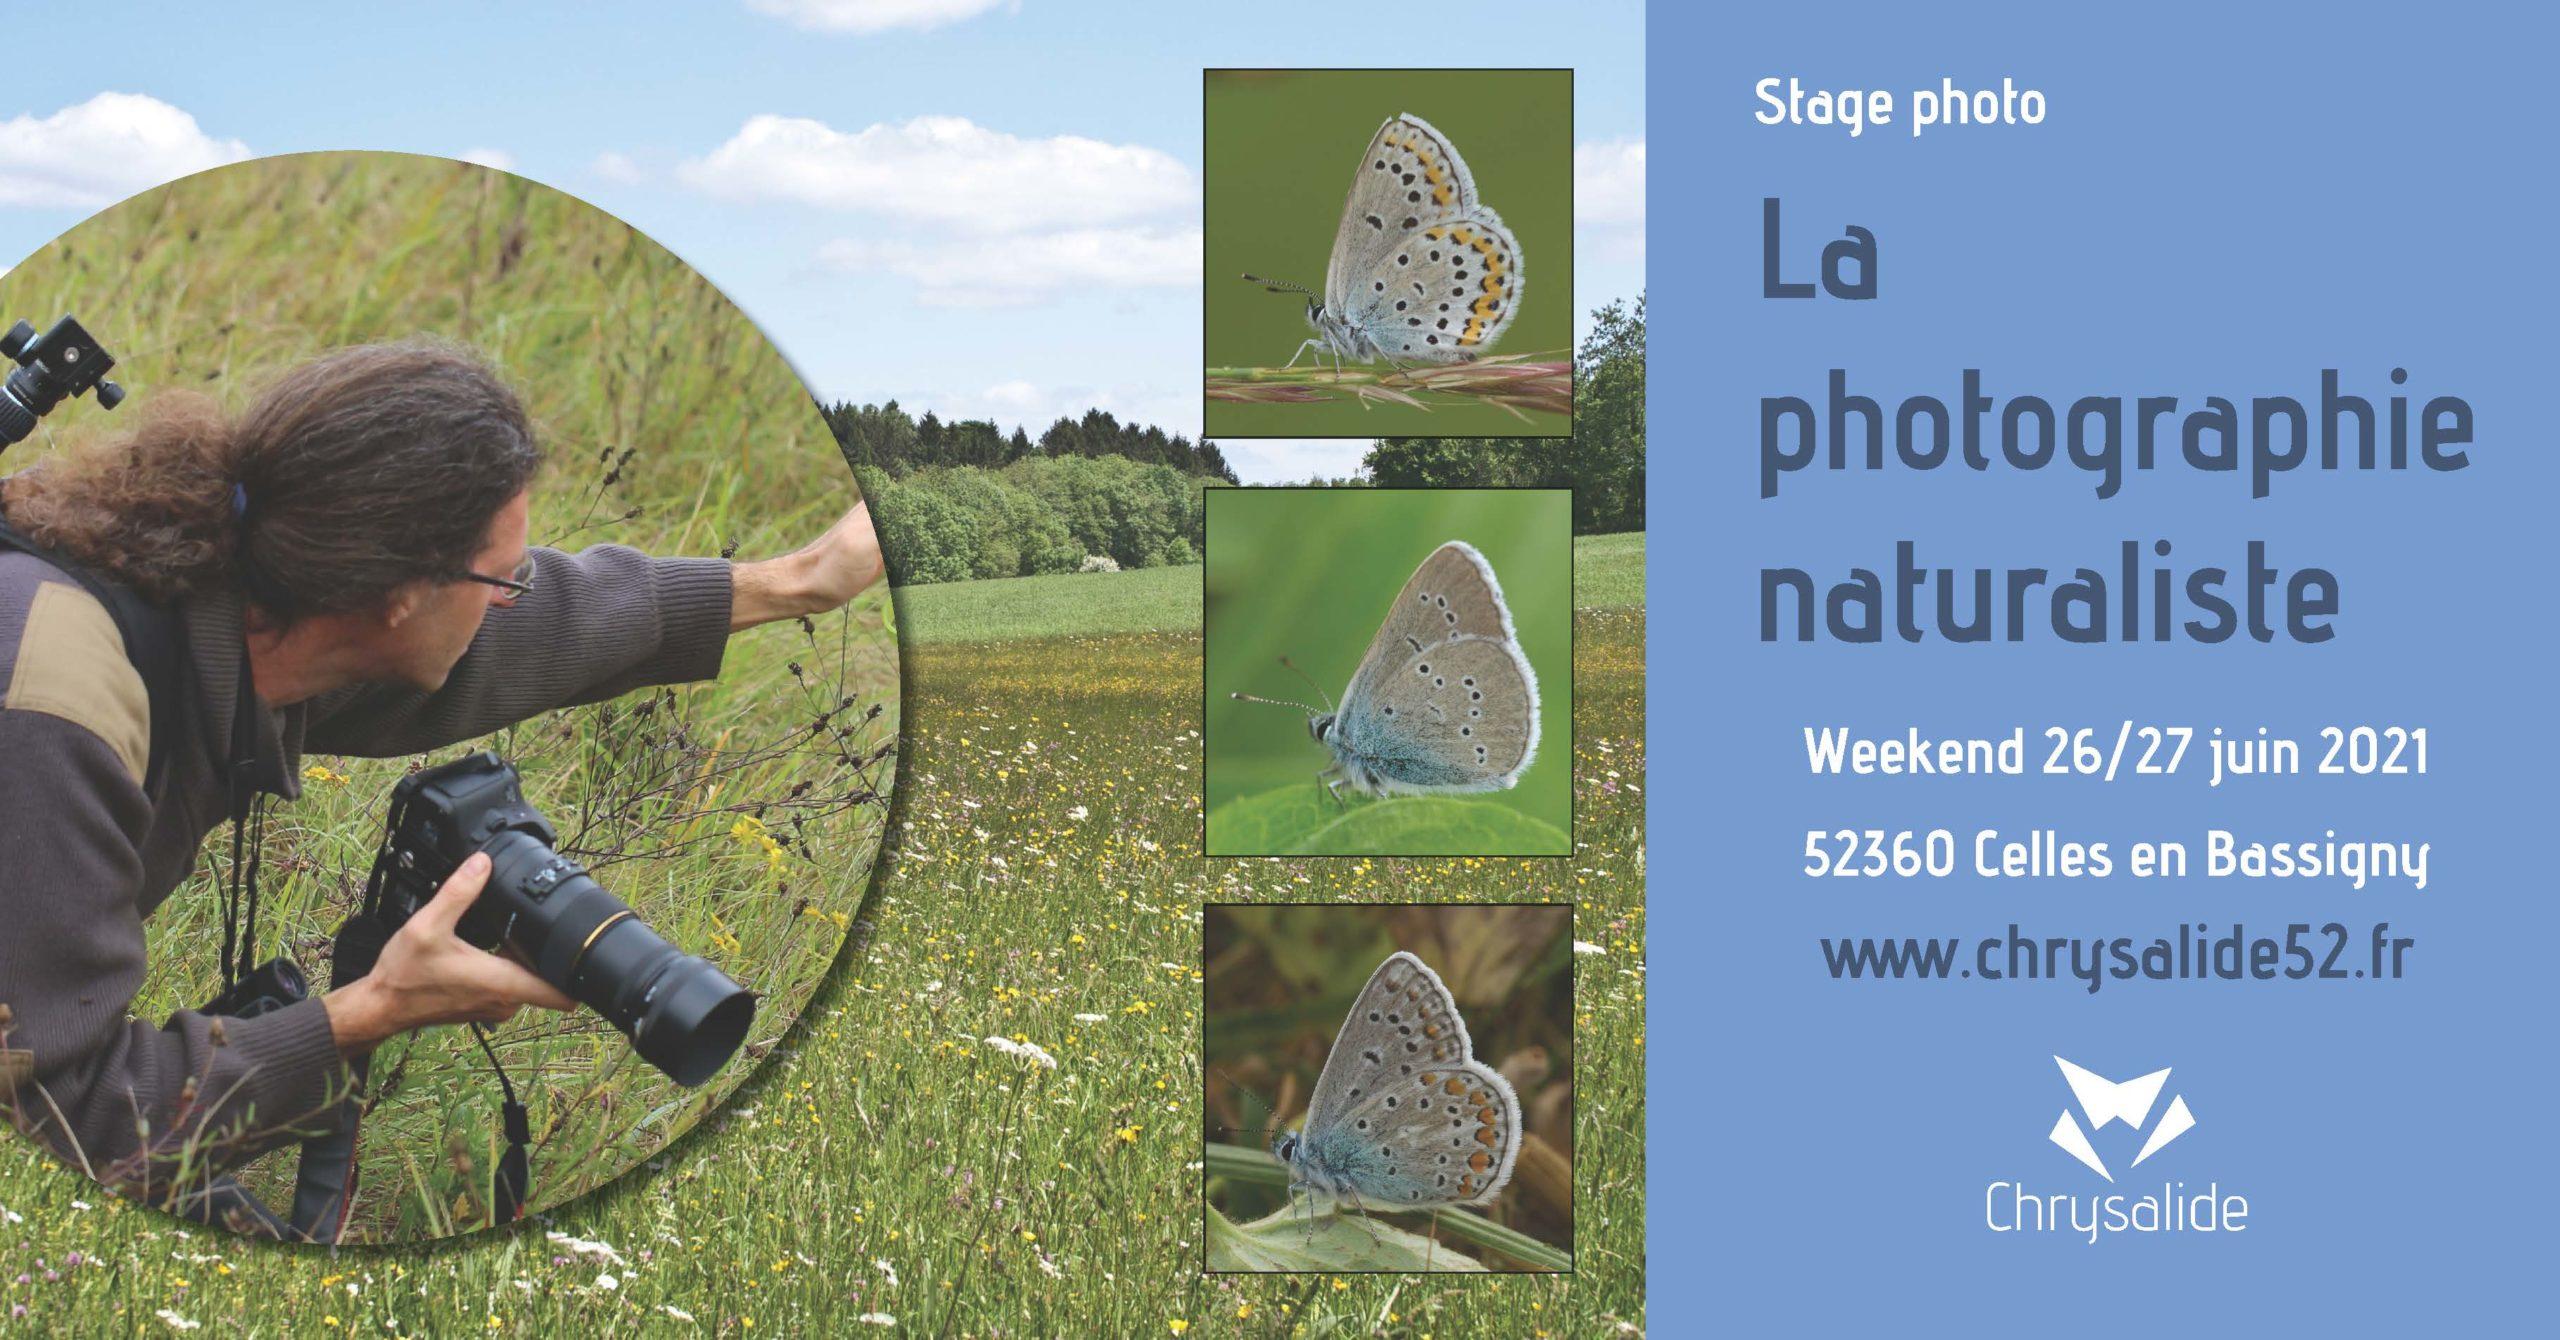 Stage photo - La photographie naturaliste - Chrysalide52 - Michael Geber - Haute-Marne